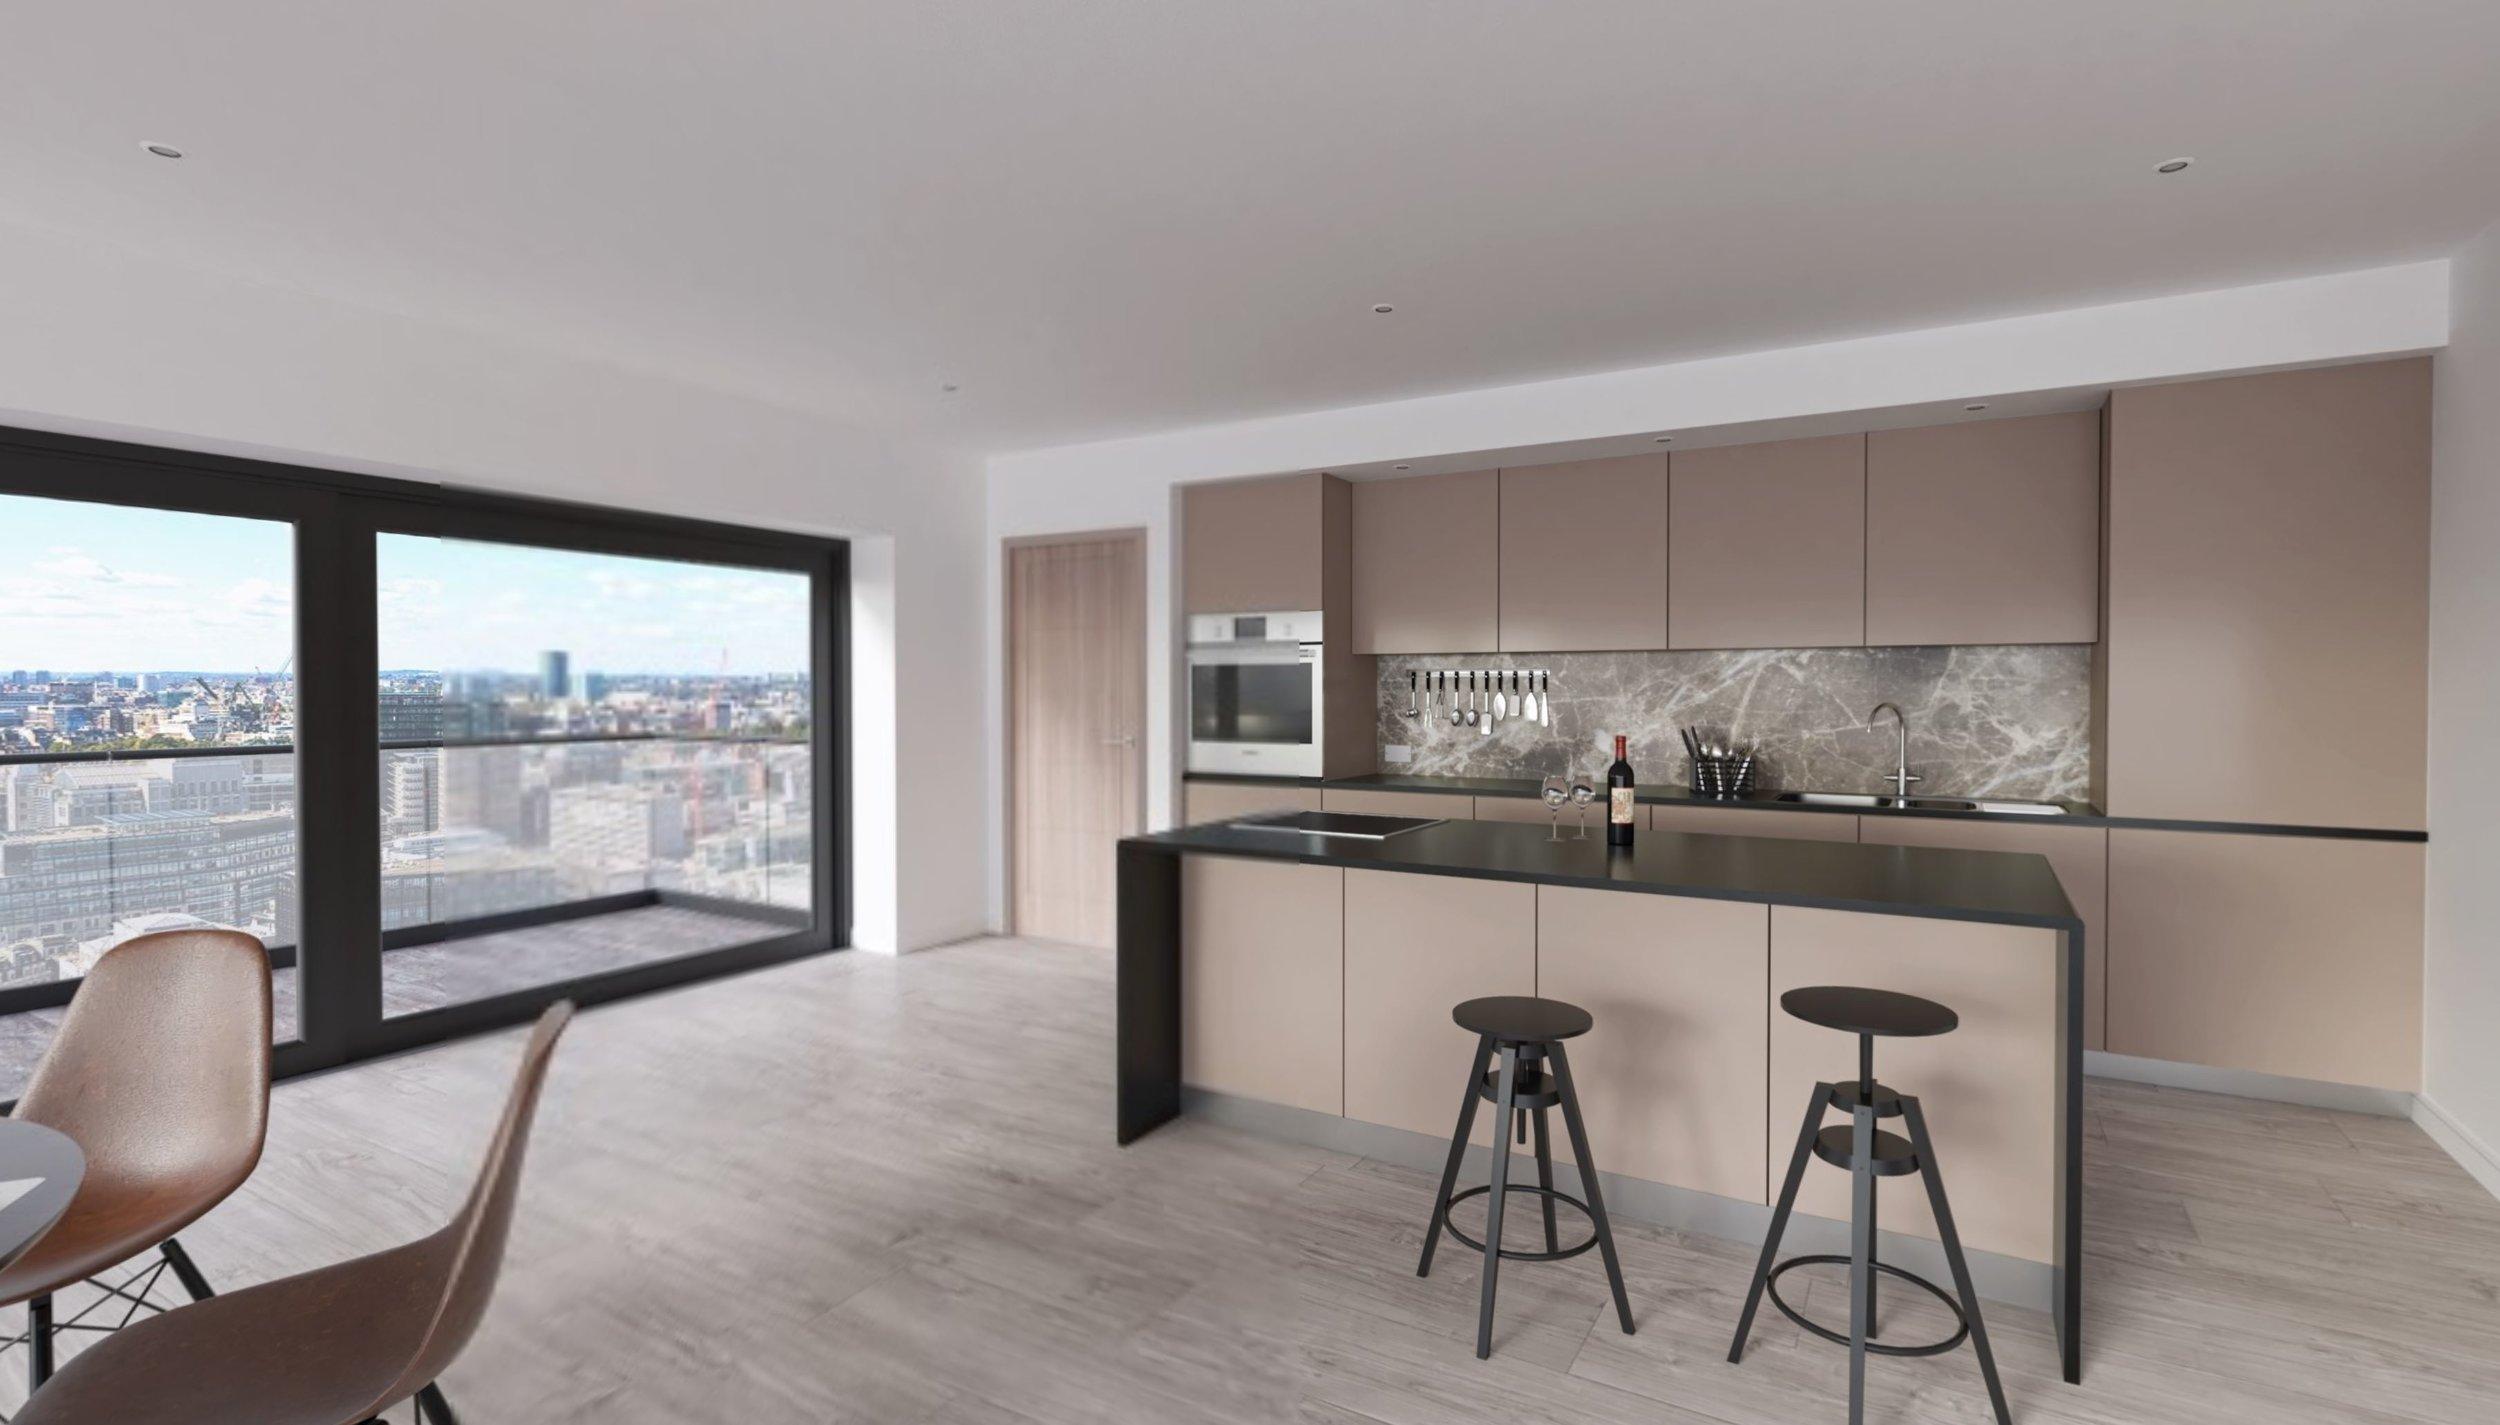 Contemporary simplistic kitchen design in a London apartment